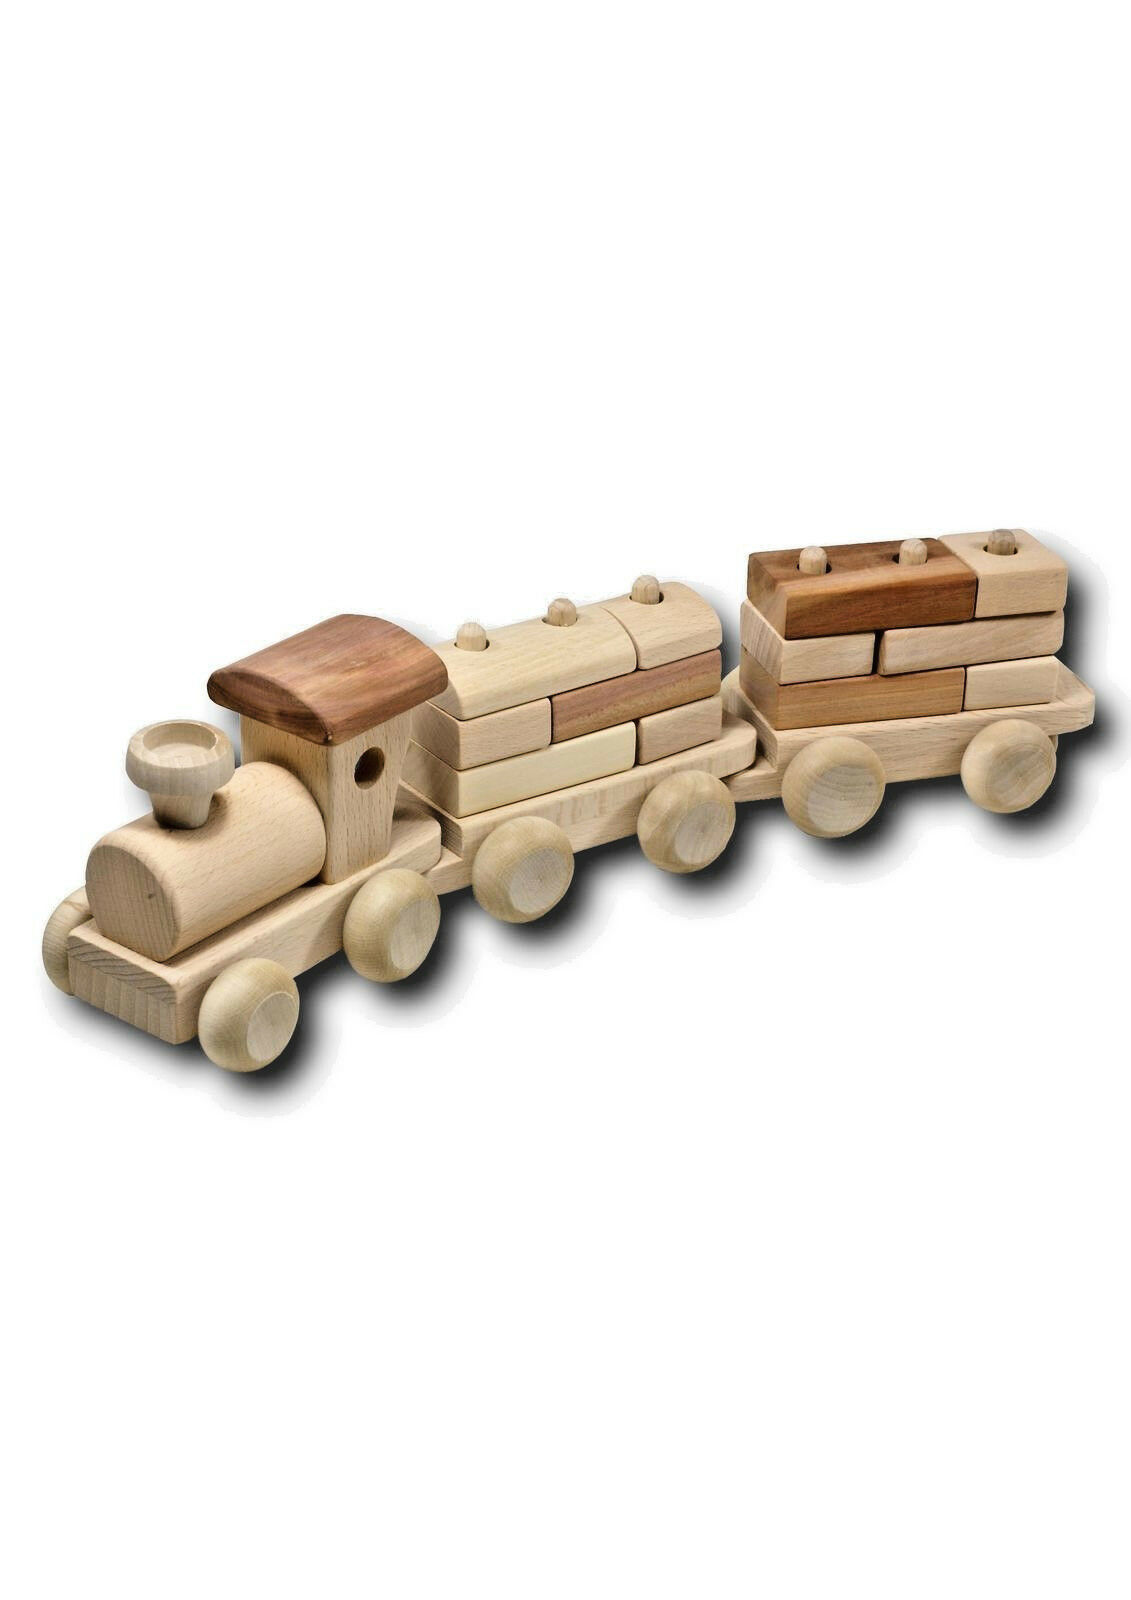 Train 2 Wagons with Bauklötzern of Wood 34 Cm